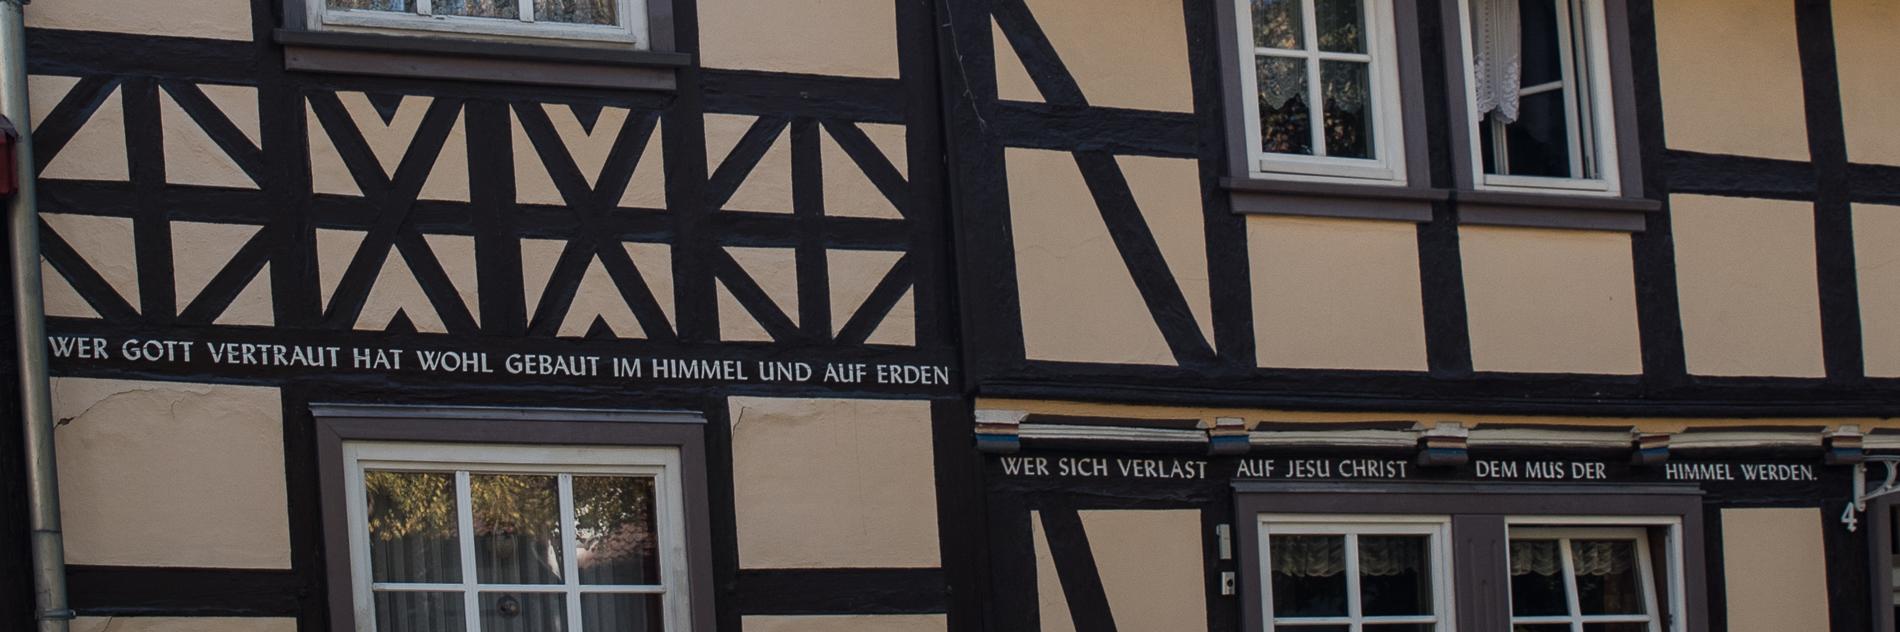 Werratalradweg, Eisenach – Hörschel – Eschwege